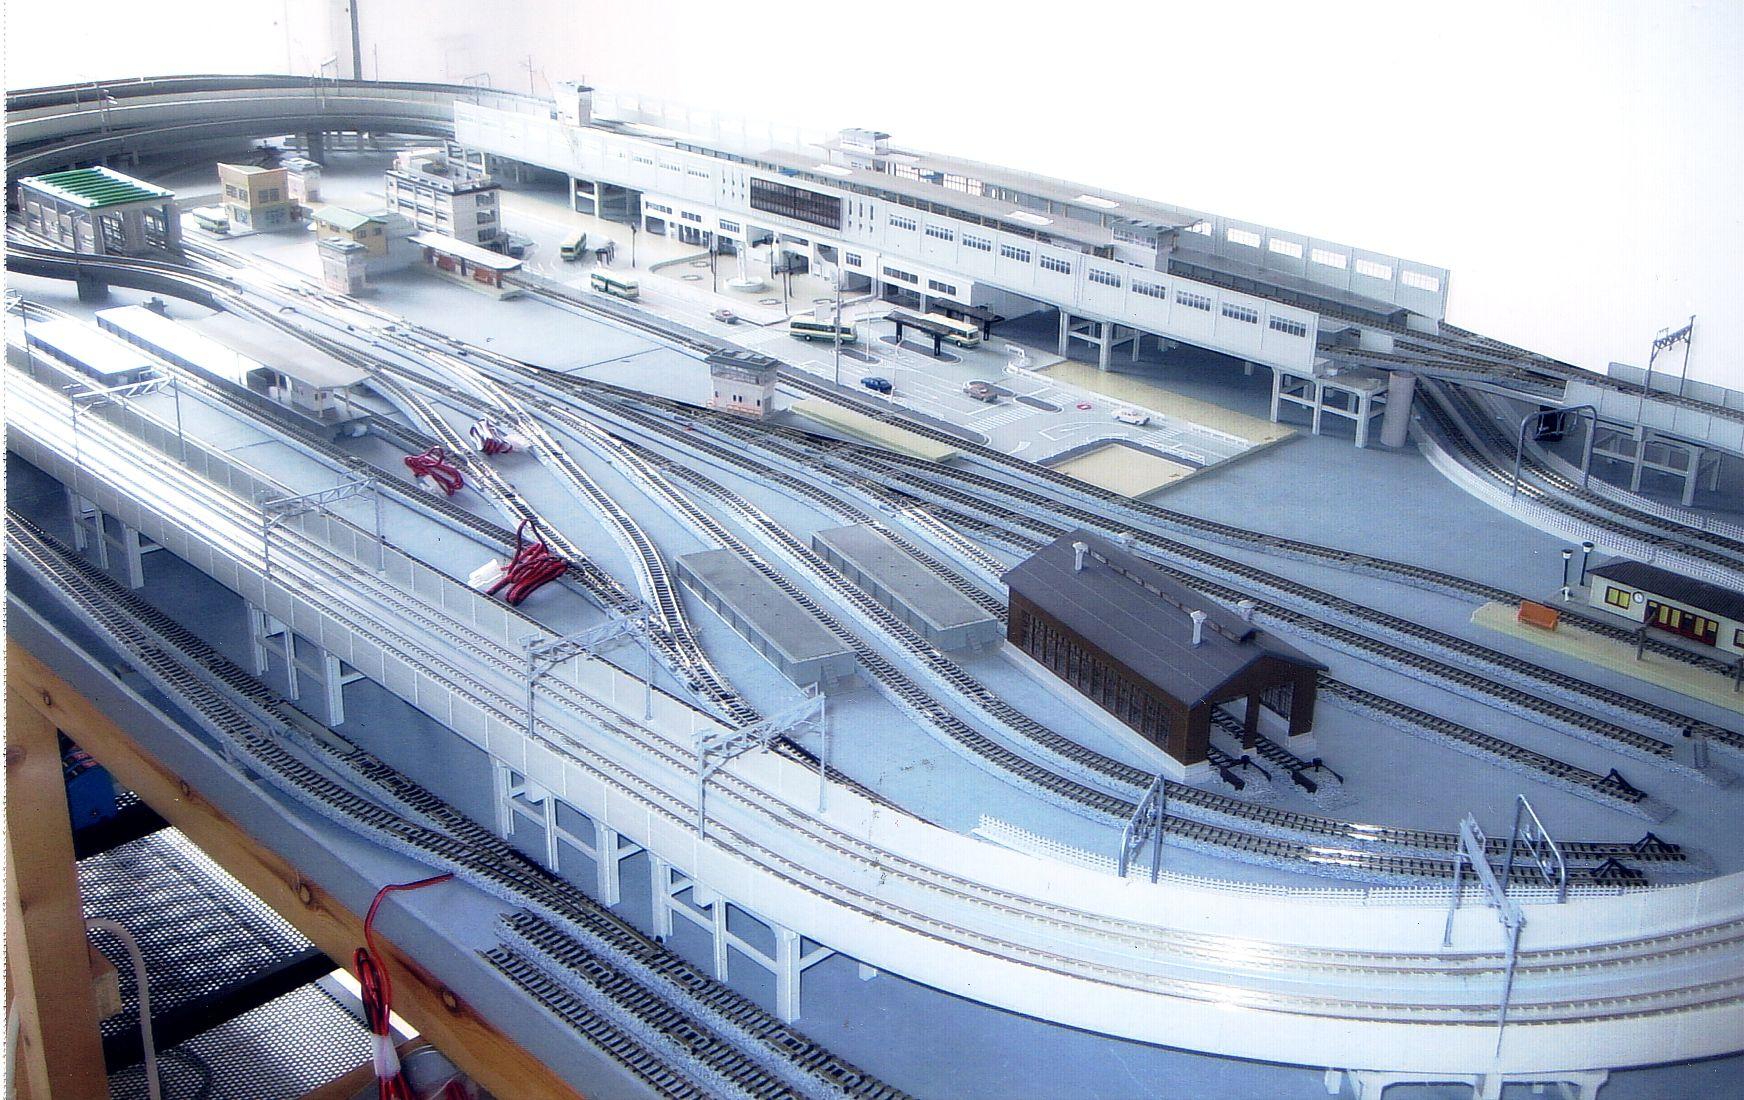 N Scale Bedroom Track Plans | Kato N Unitrack Track Plan ...